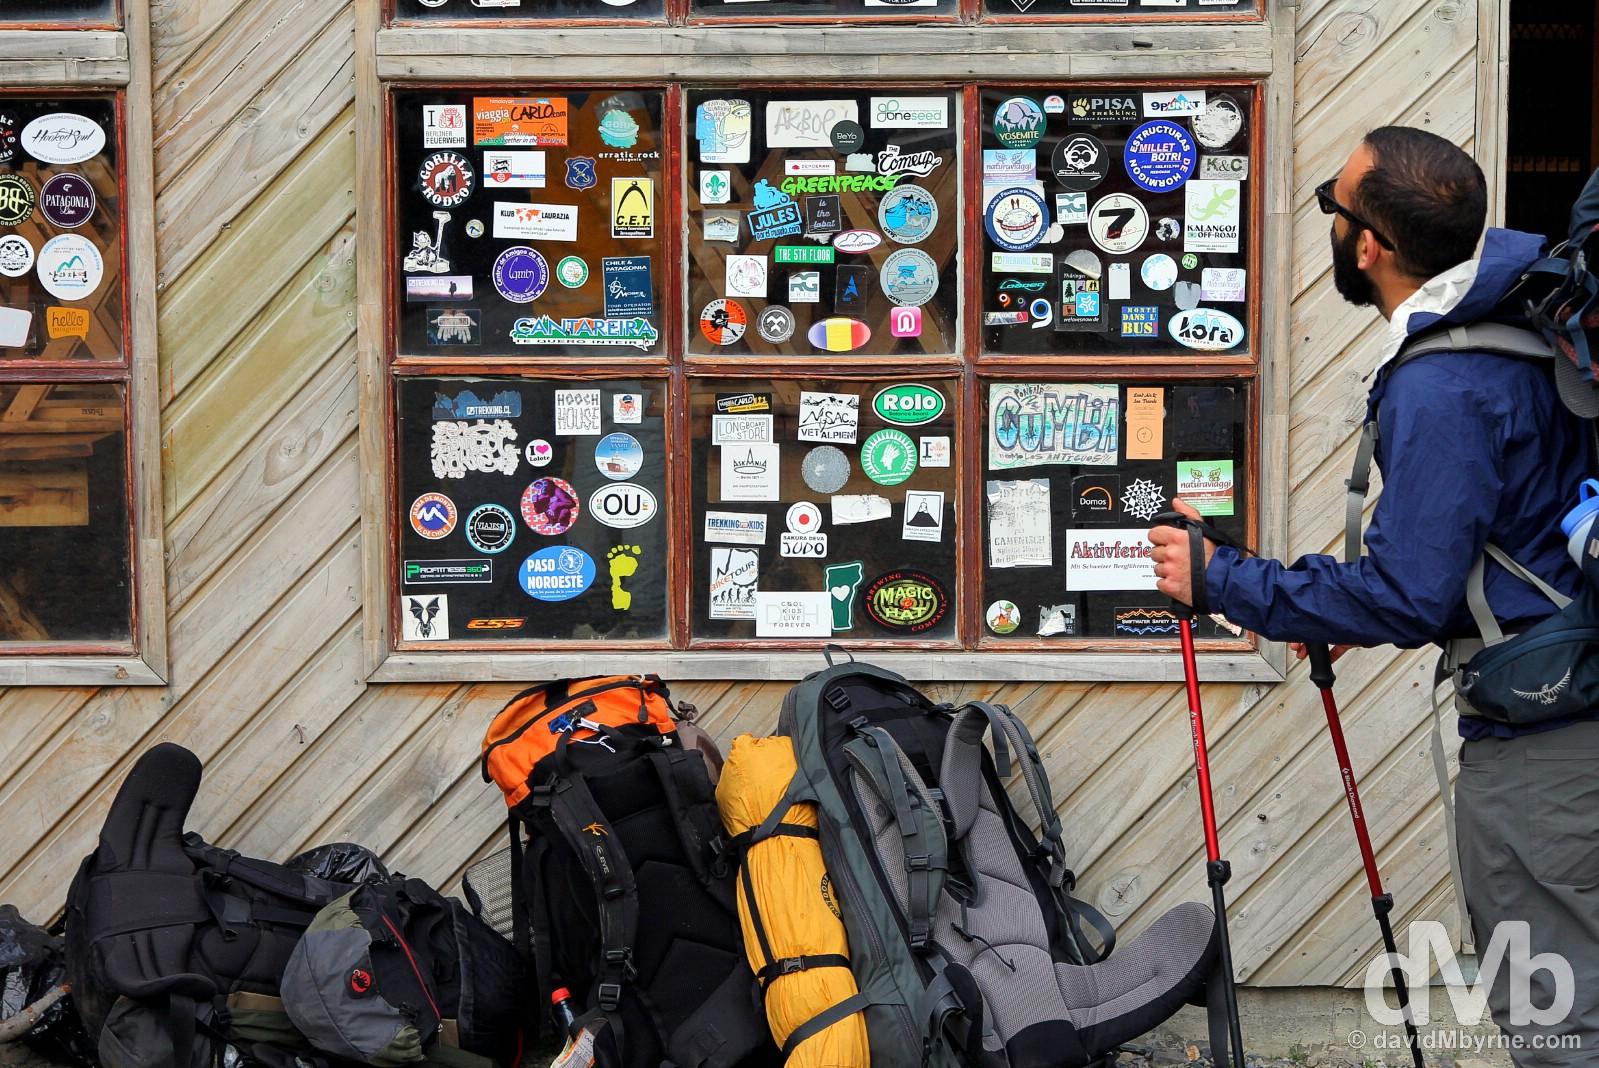 Refugio y Campamento Chileno in Torres del Paine National Park, Chile. November 24, 2015.